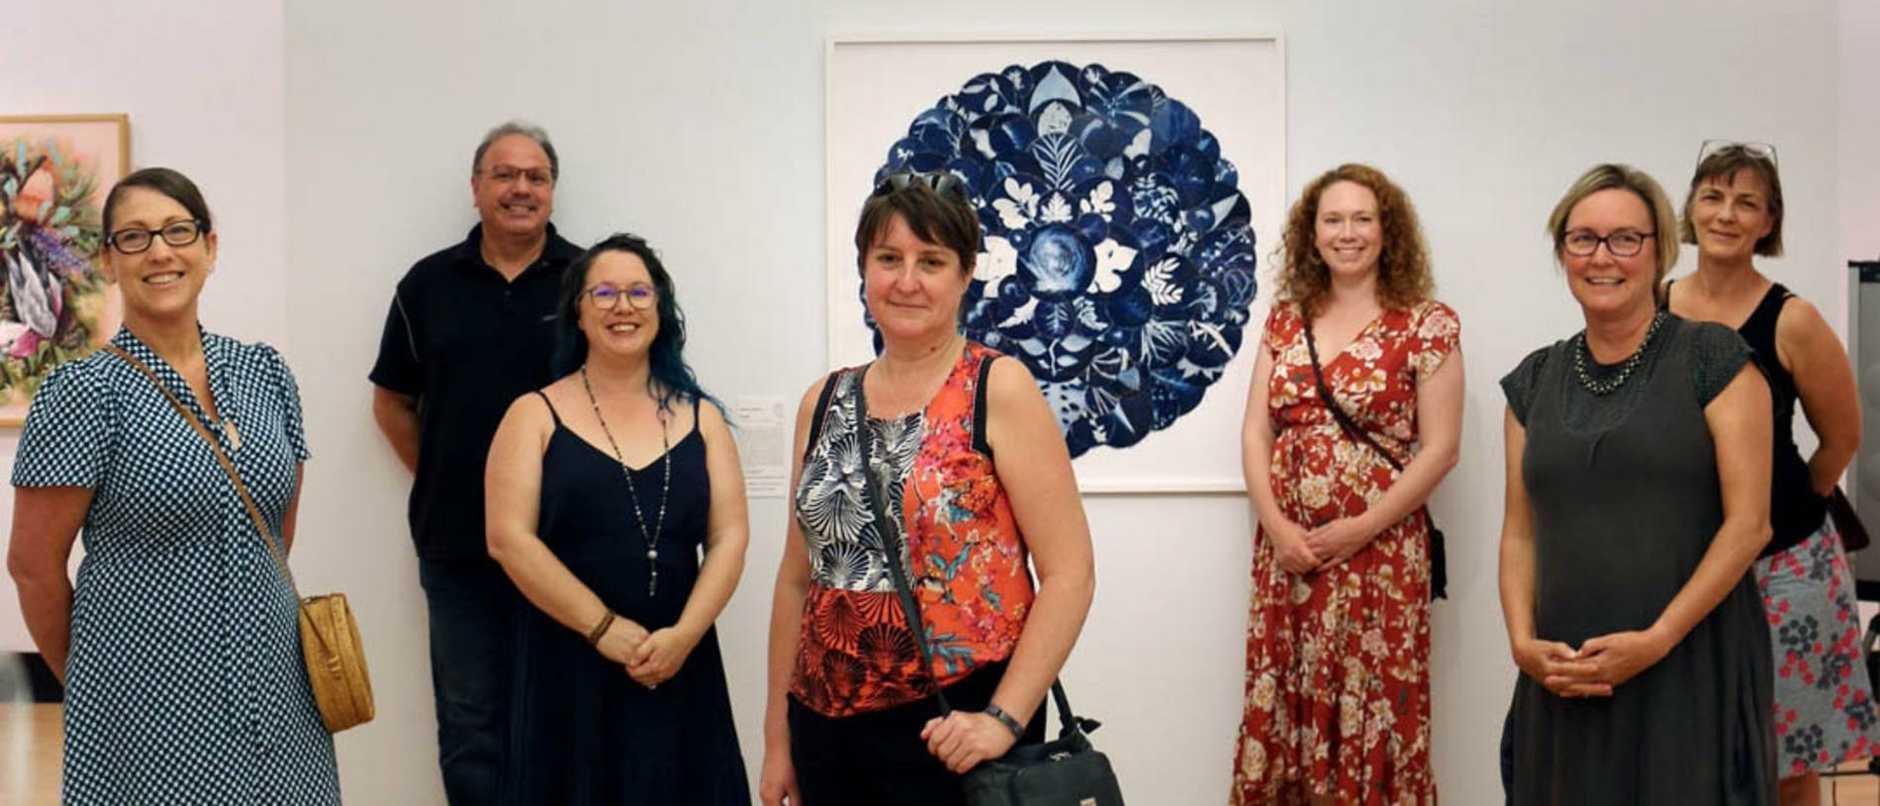 Local artists Donna Davis, Grant Quinn, Kylie Stevens, LeAnne Vincent (centre), Renee Yates, Deb Mostert and Jane du Rand. Pic: Ipswich City Council